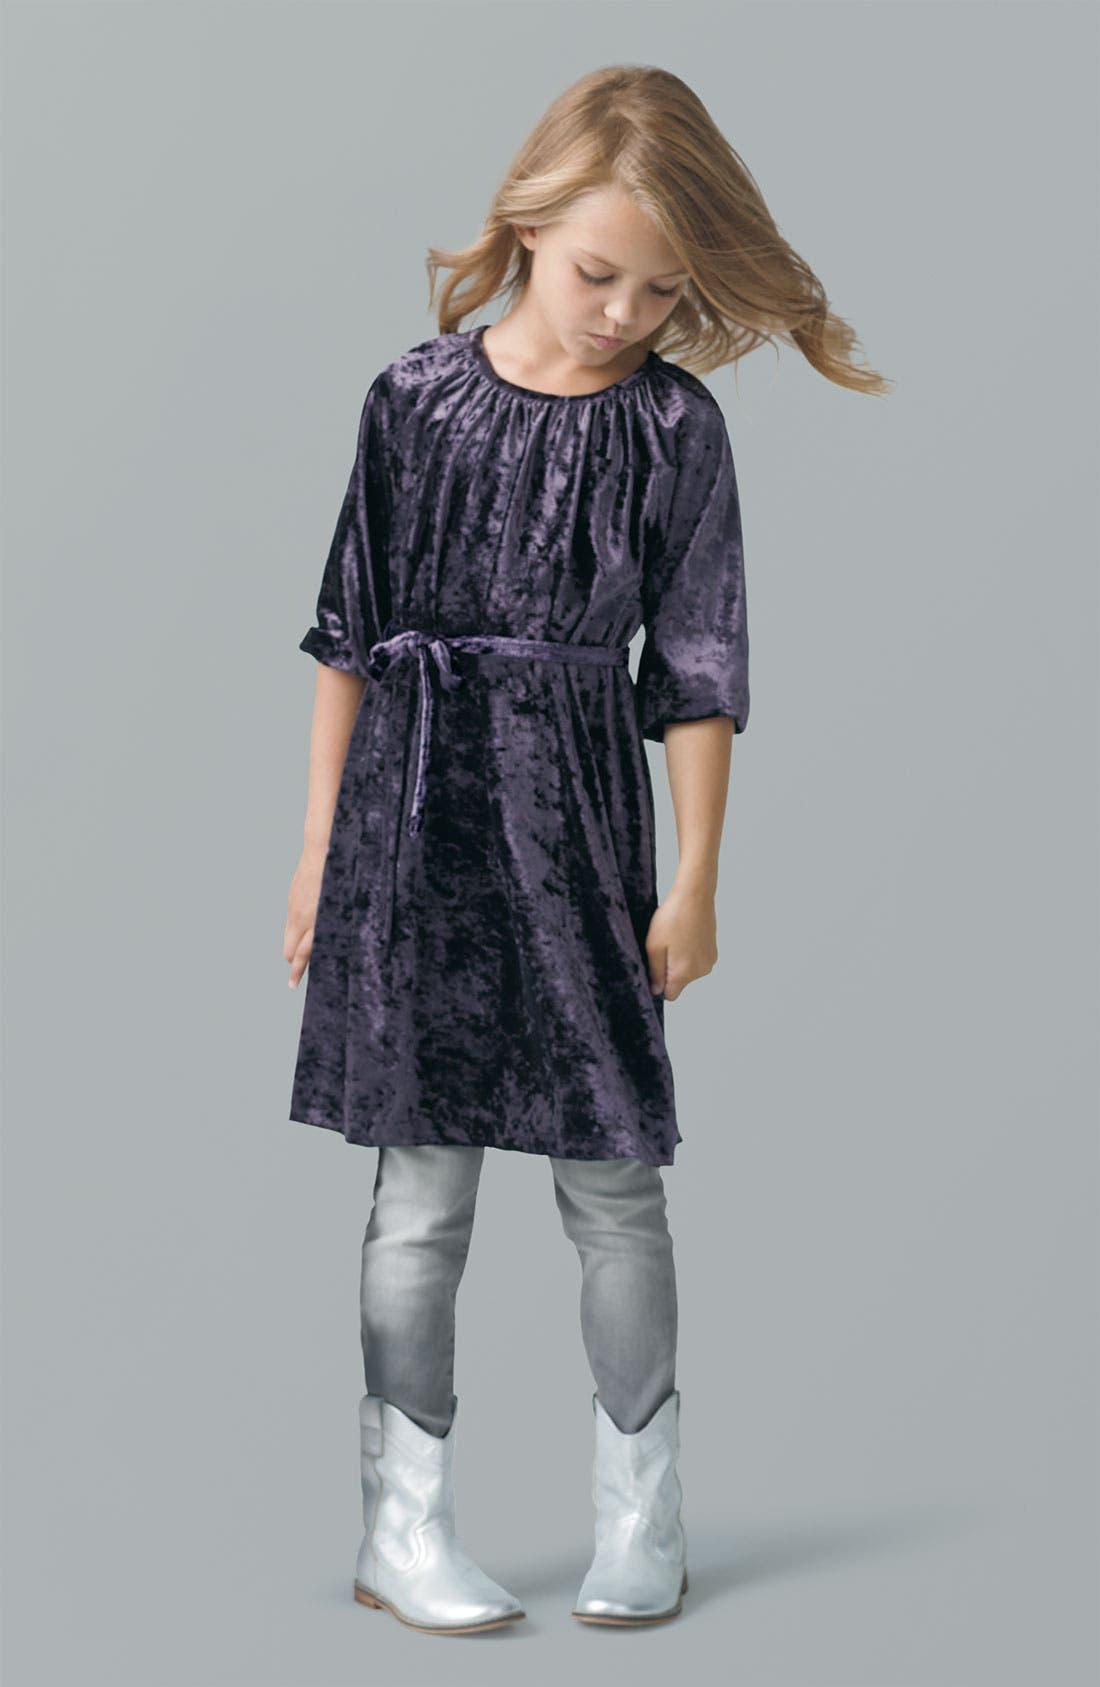 Alternate Image 1 Selected - Peek Dress & Jeans (Toddler, Little Girls & Big Girls)